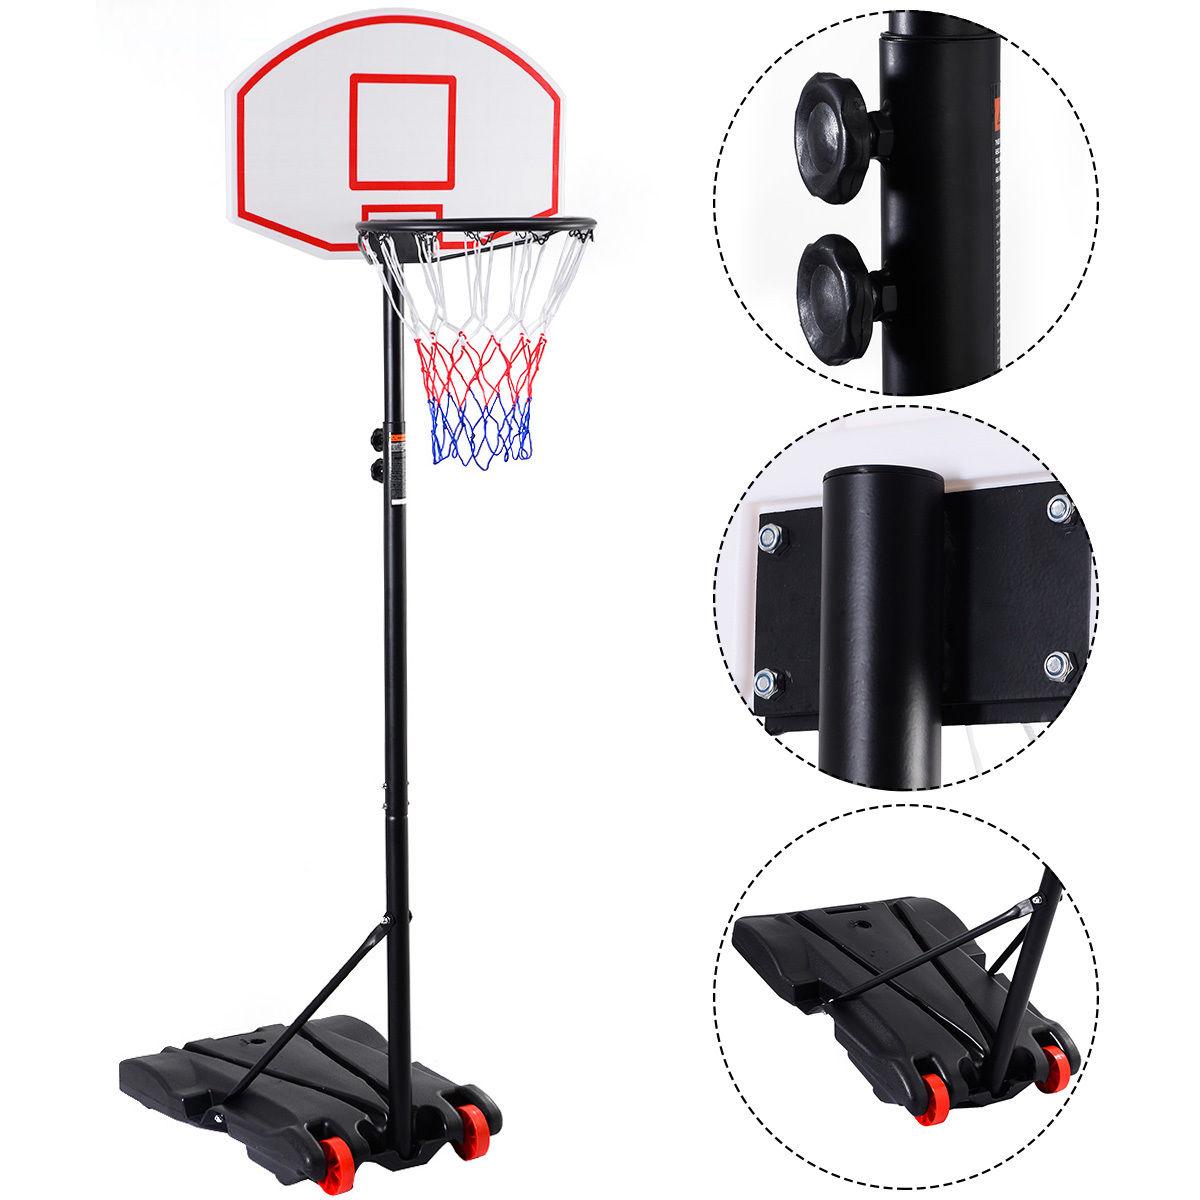 "GHP Steel Frame PE Panel 64.9""-83.8"" Adjustable Height Kids Basketball Hoop System"